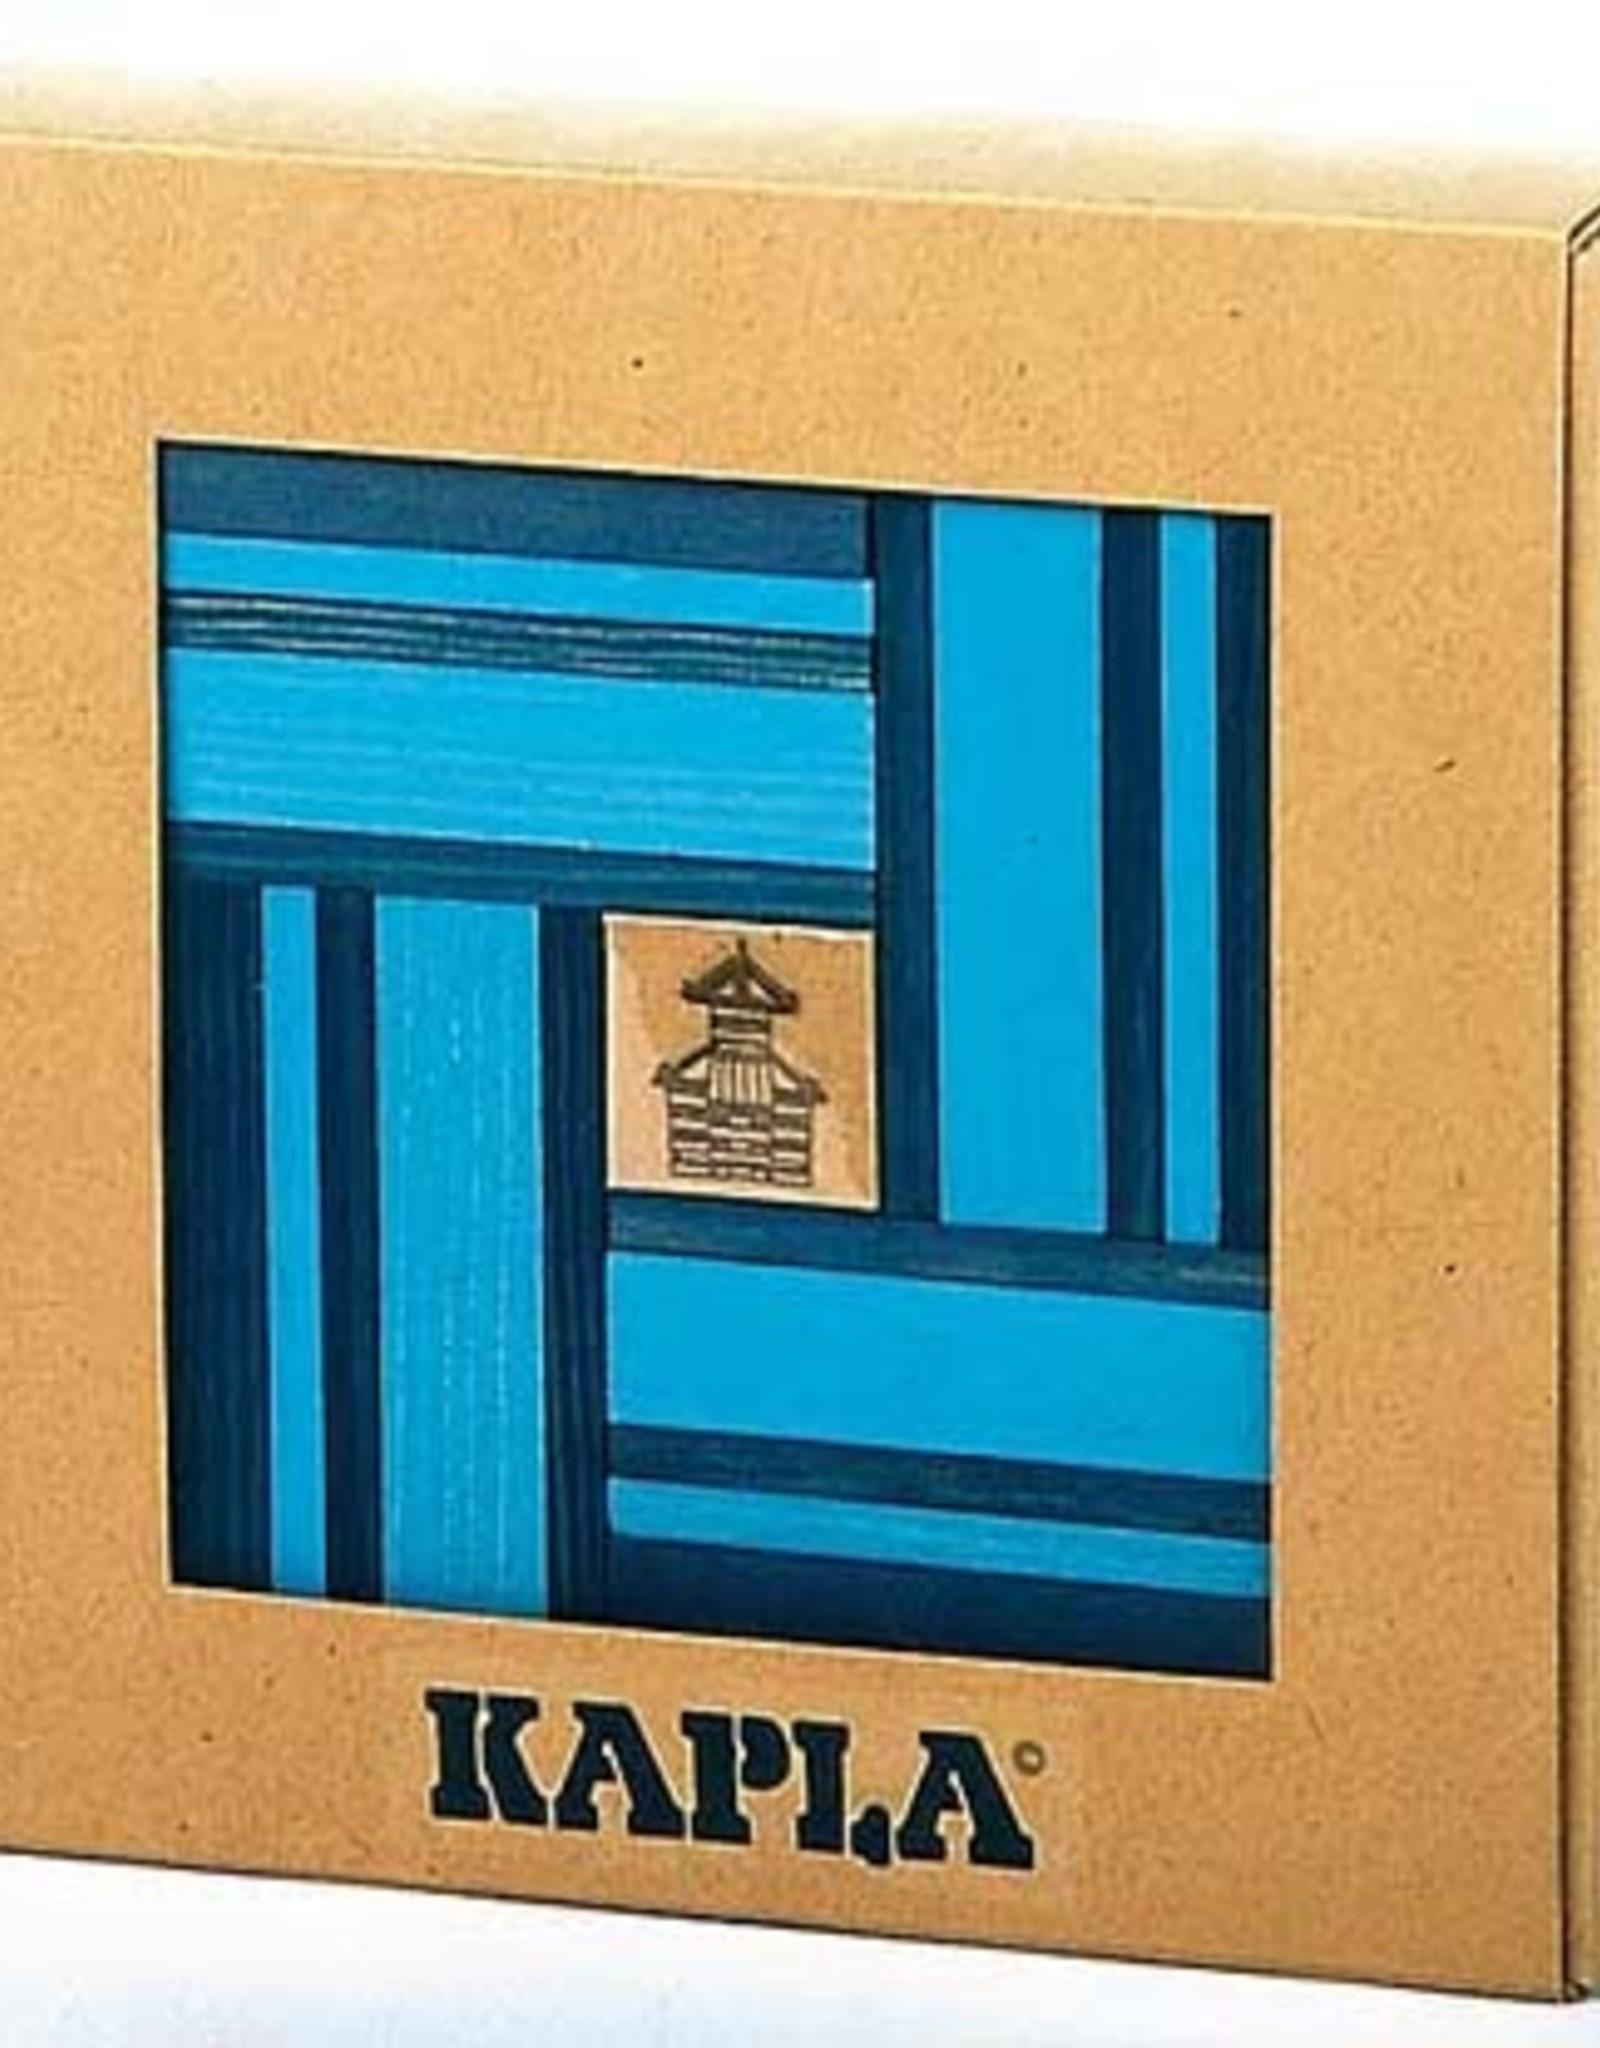 Kapla Kapla Kadoset blauw 40 stukjes & boek